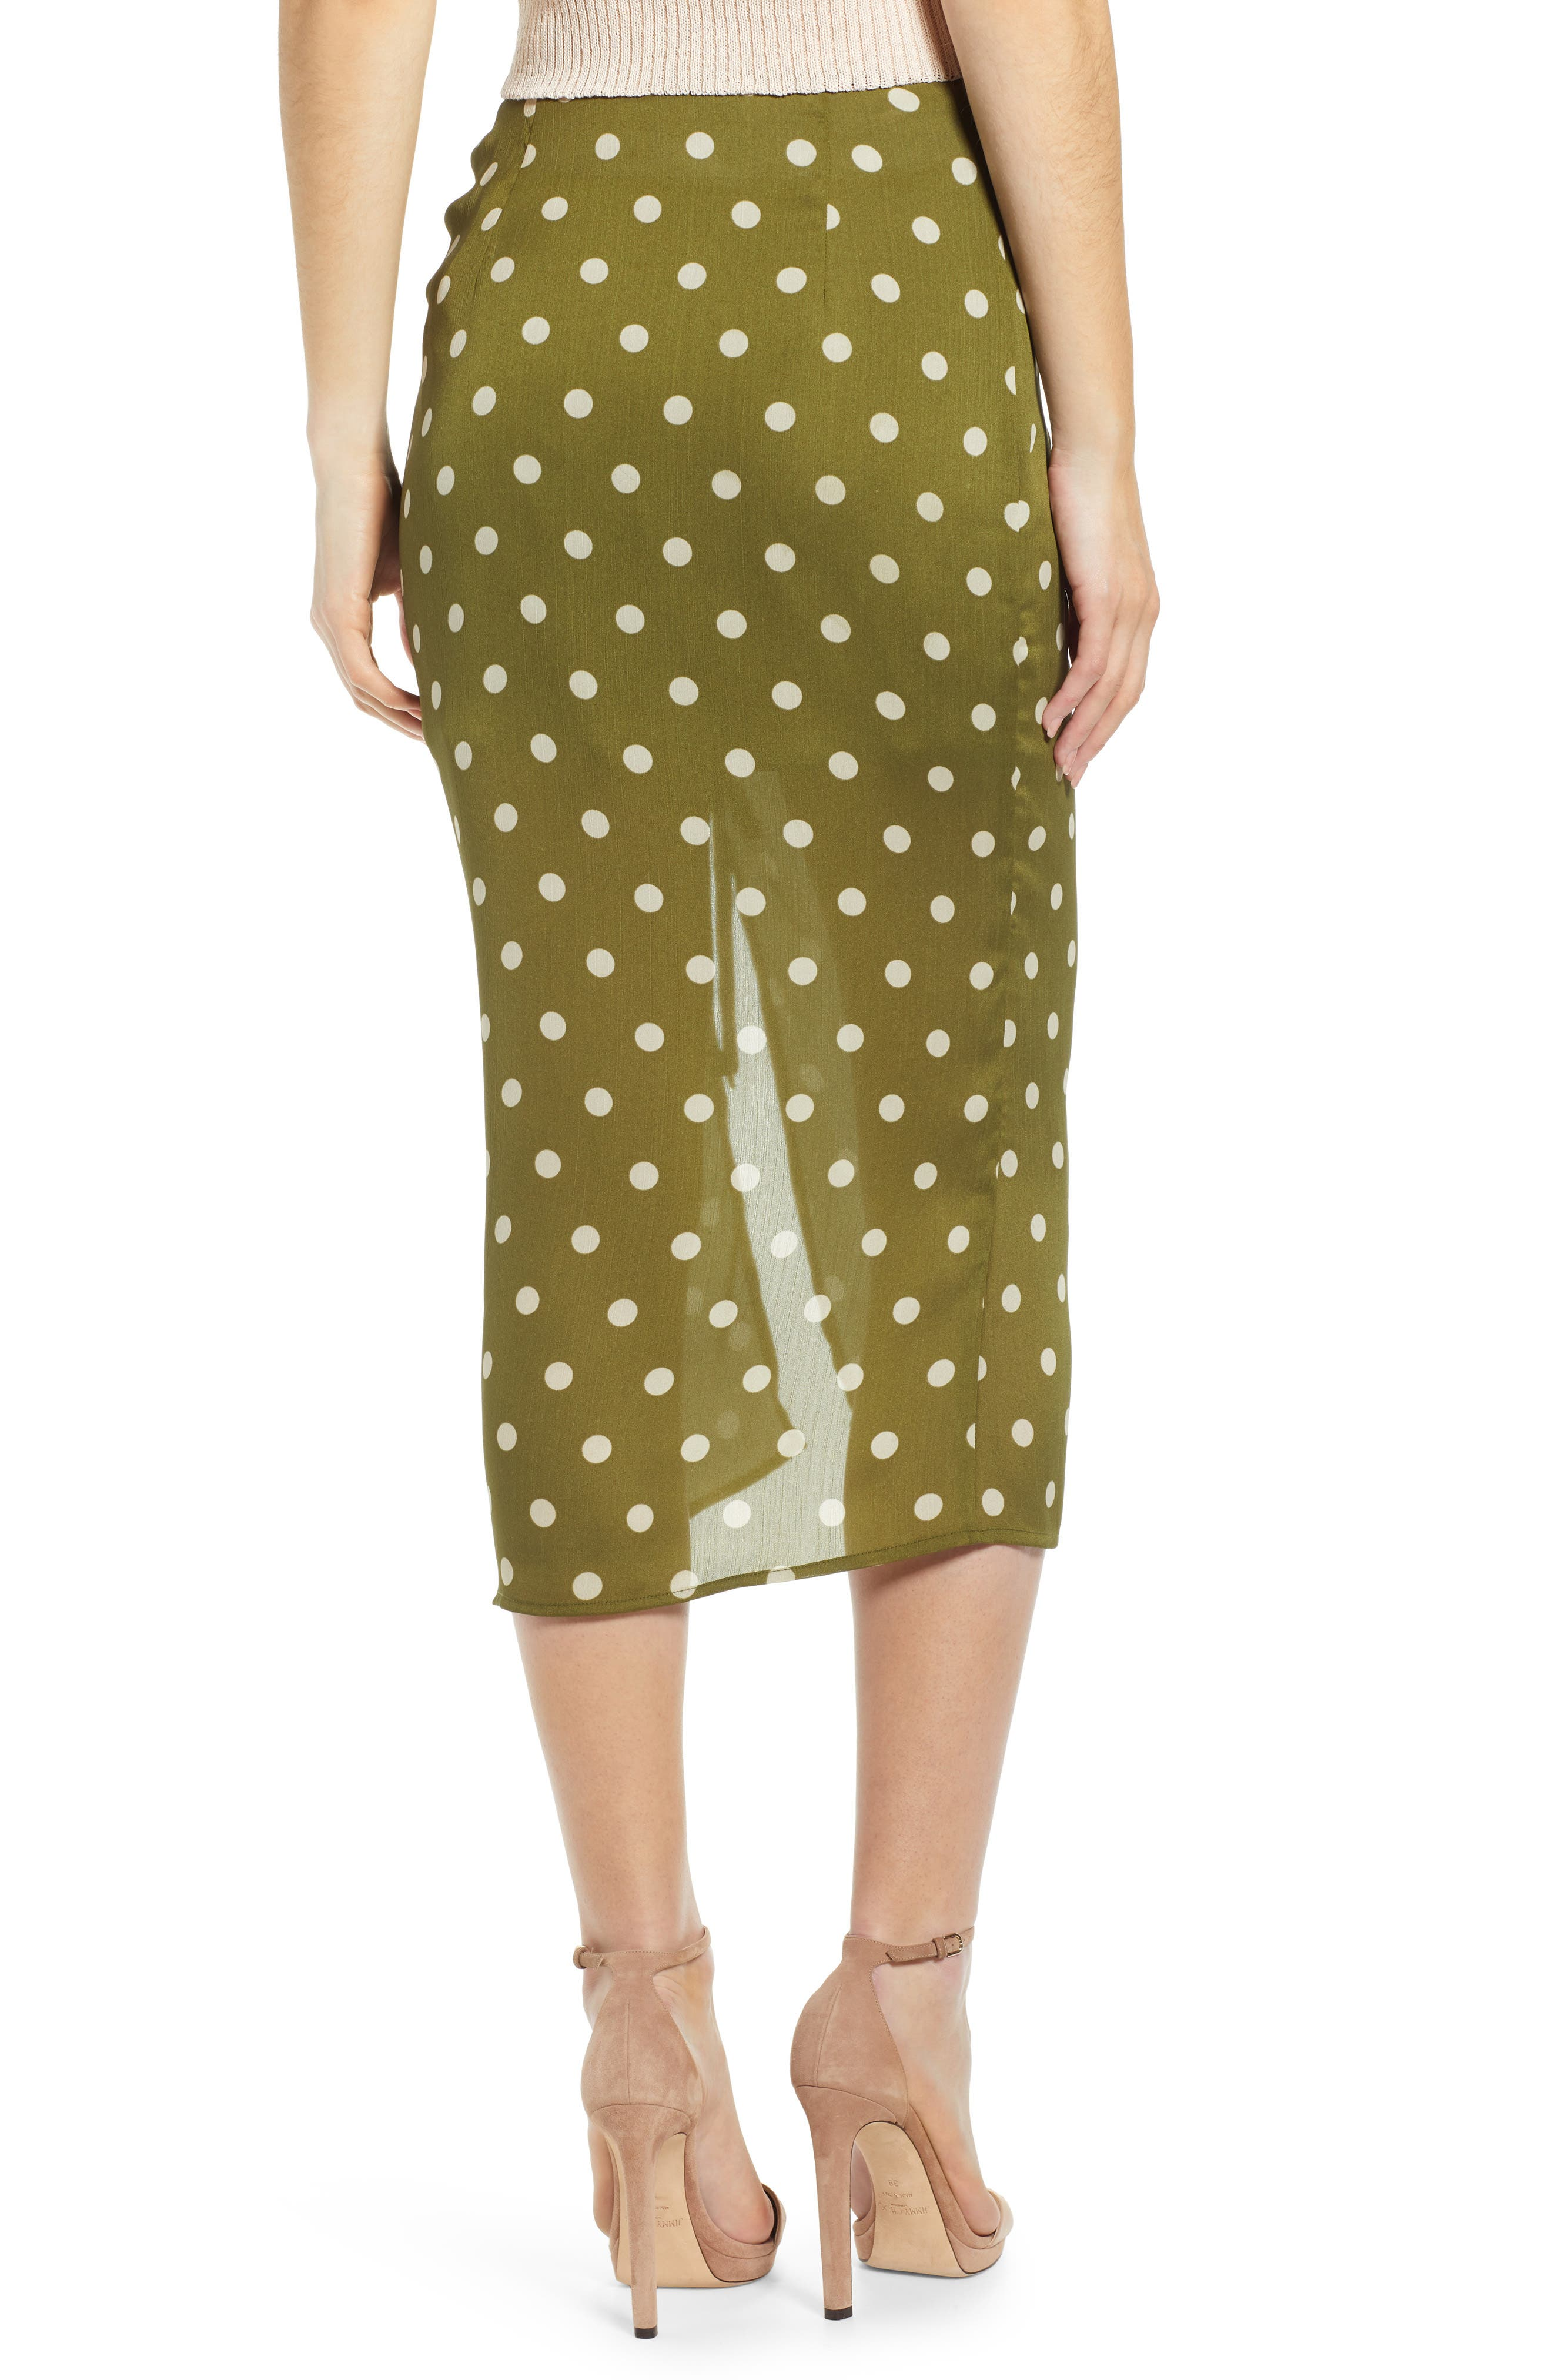 CHRISELLE LIM COLLECTION, Chriselle Lim Ren Ruched Skirt, Alternate thumbnail 2, color, CREAM/ OLIVE